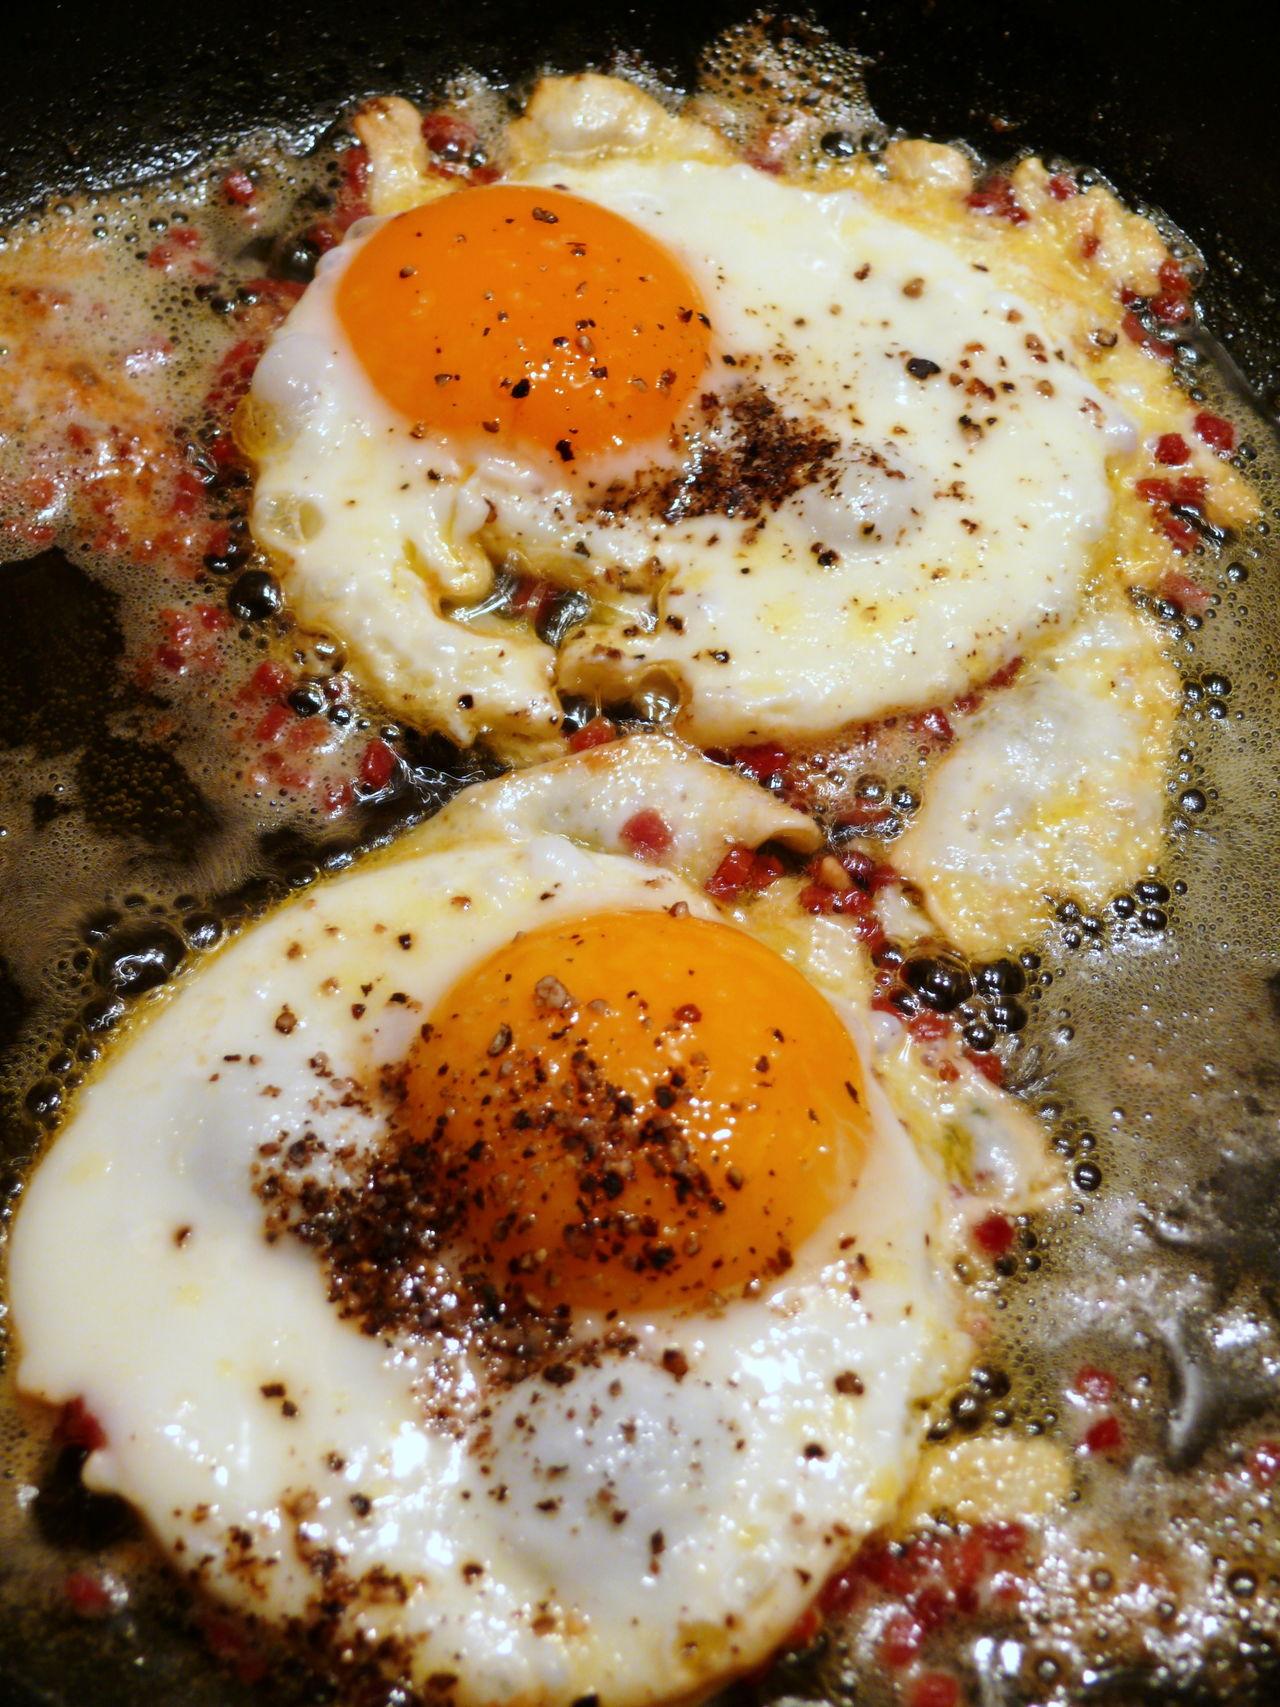 Breakfast Close-up Food And Drink Frühstück Frühstücksei Ham And Eggs Healthy Eating Ready-to-eat Speck Spiegelei Still Life